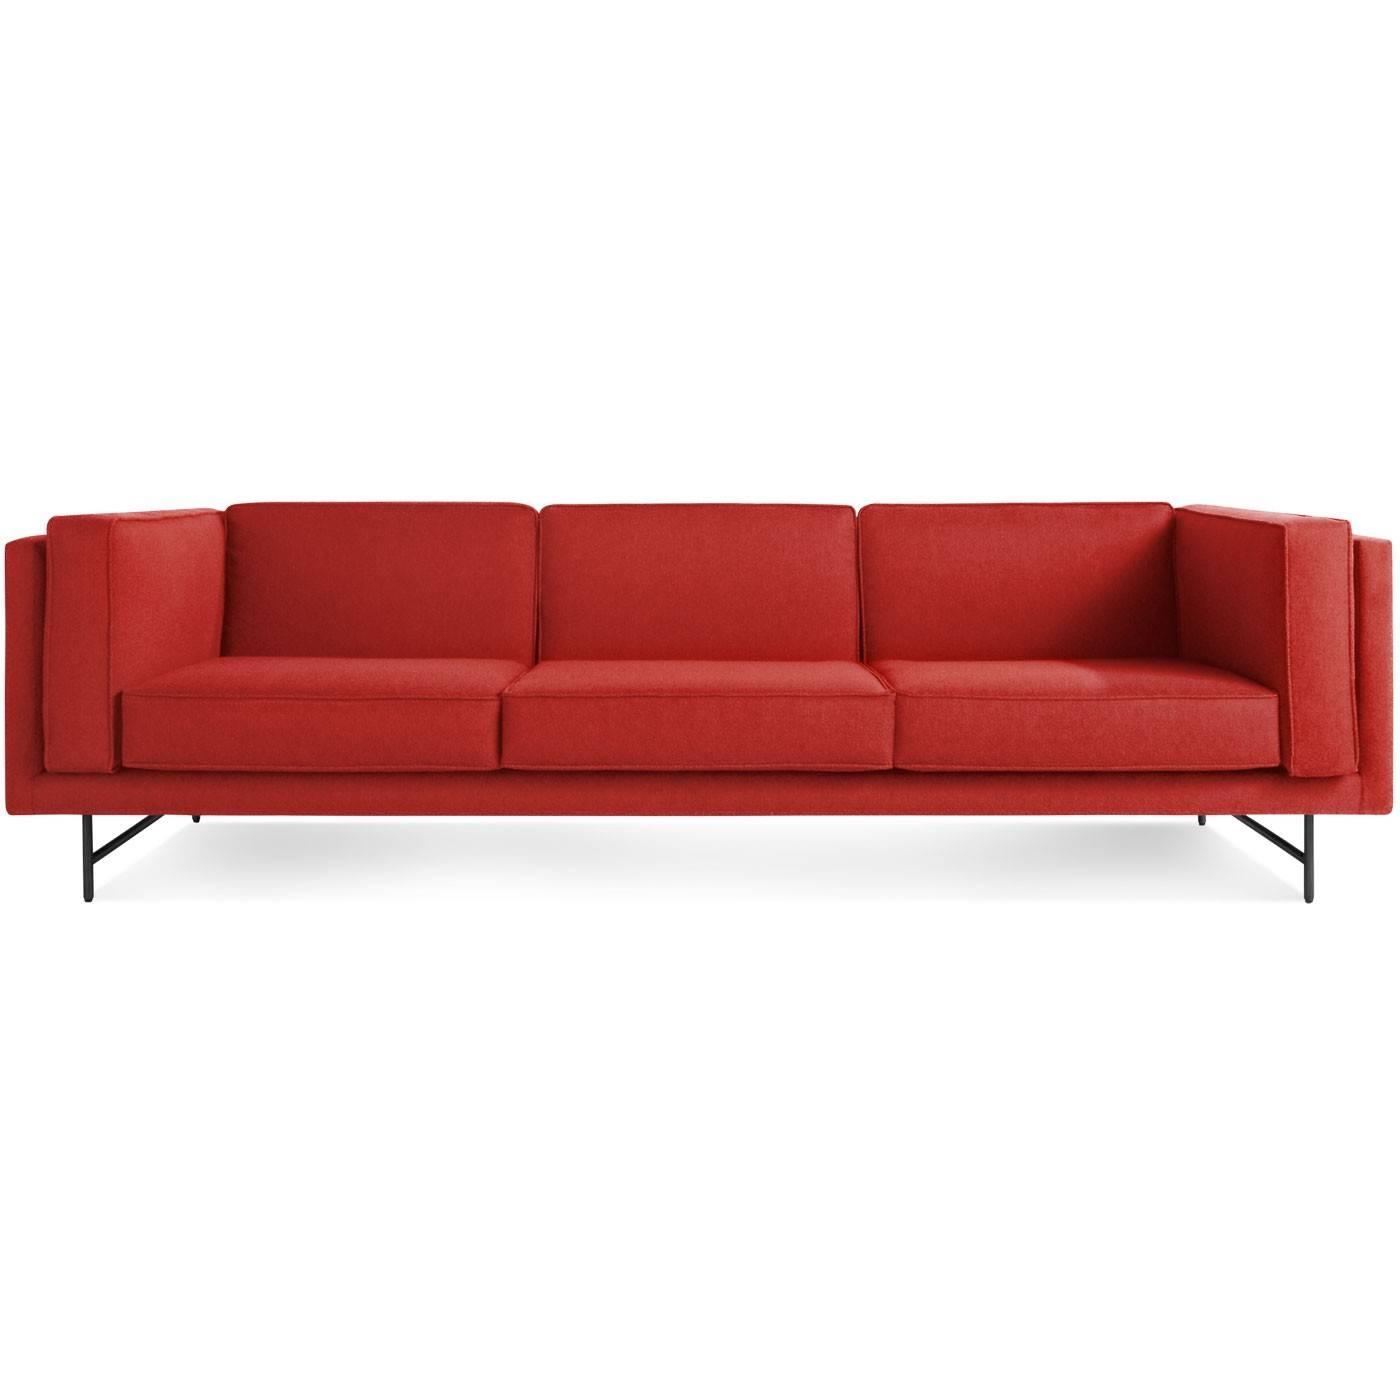 "Bank 96"" Deep Seat Sofa - Low Profile Sofa | Blu Dot inside Brick Sofas (Image 6 of 30)"